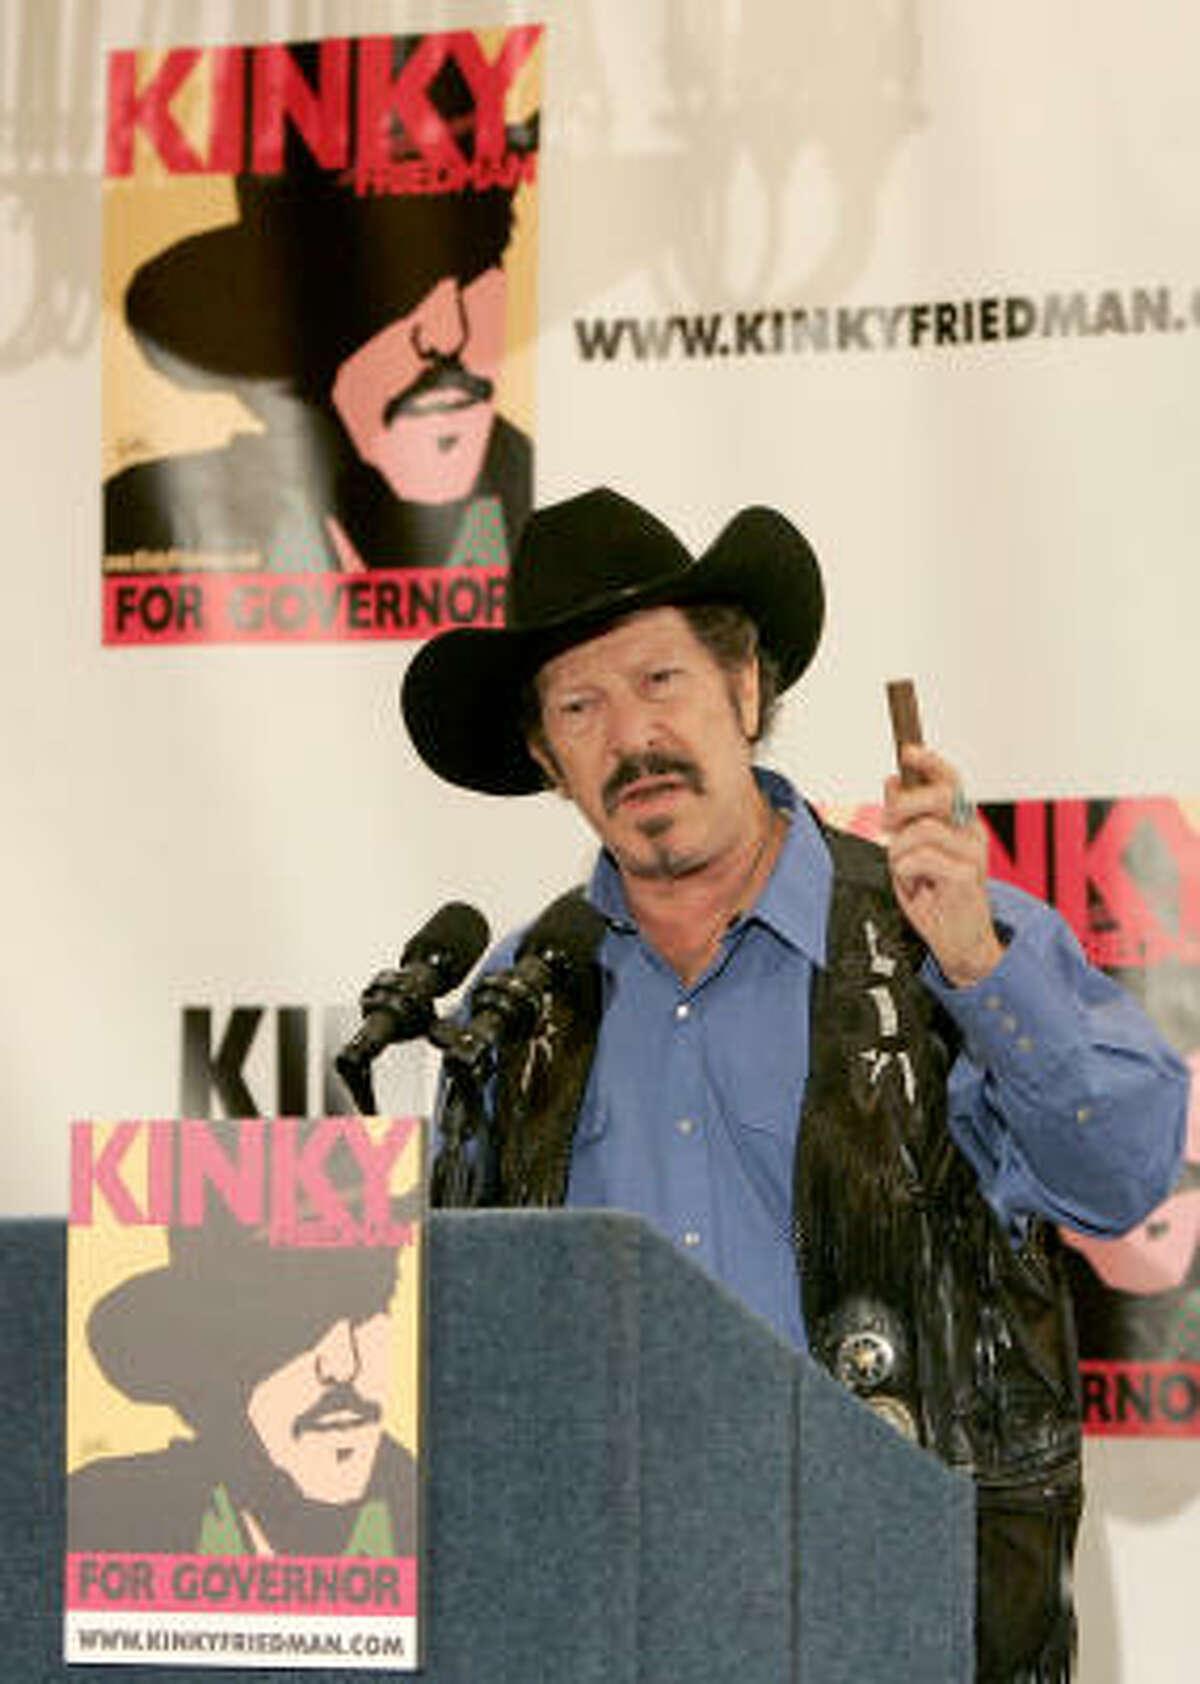 Independent gubernatorial candidate Kinky Friedman speaks during a Houston news conference.